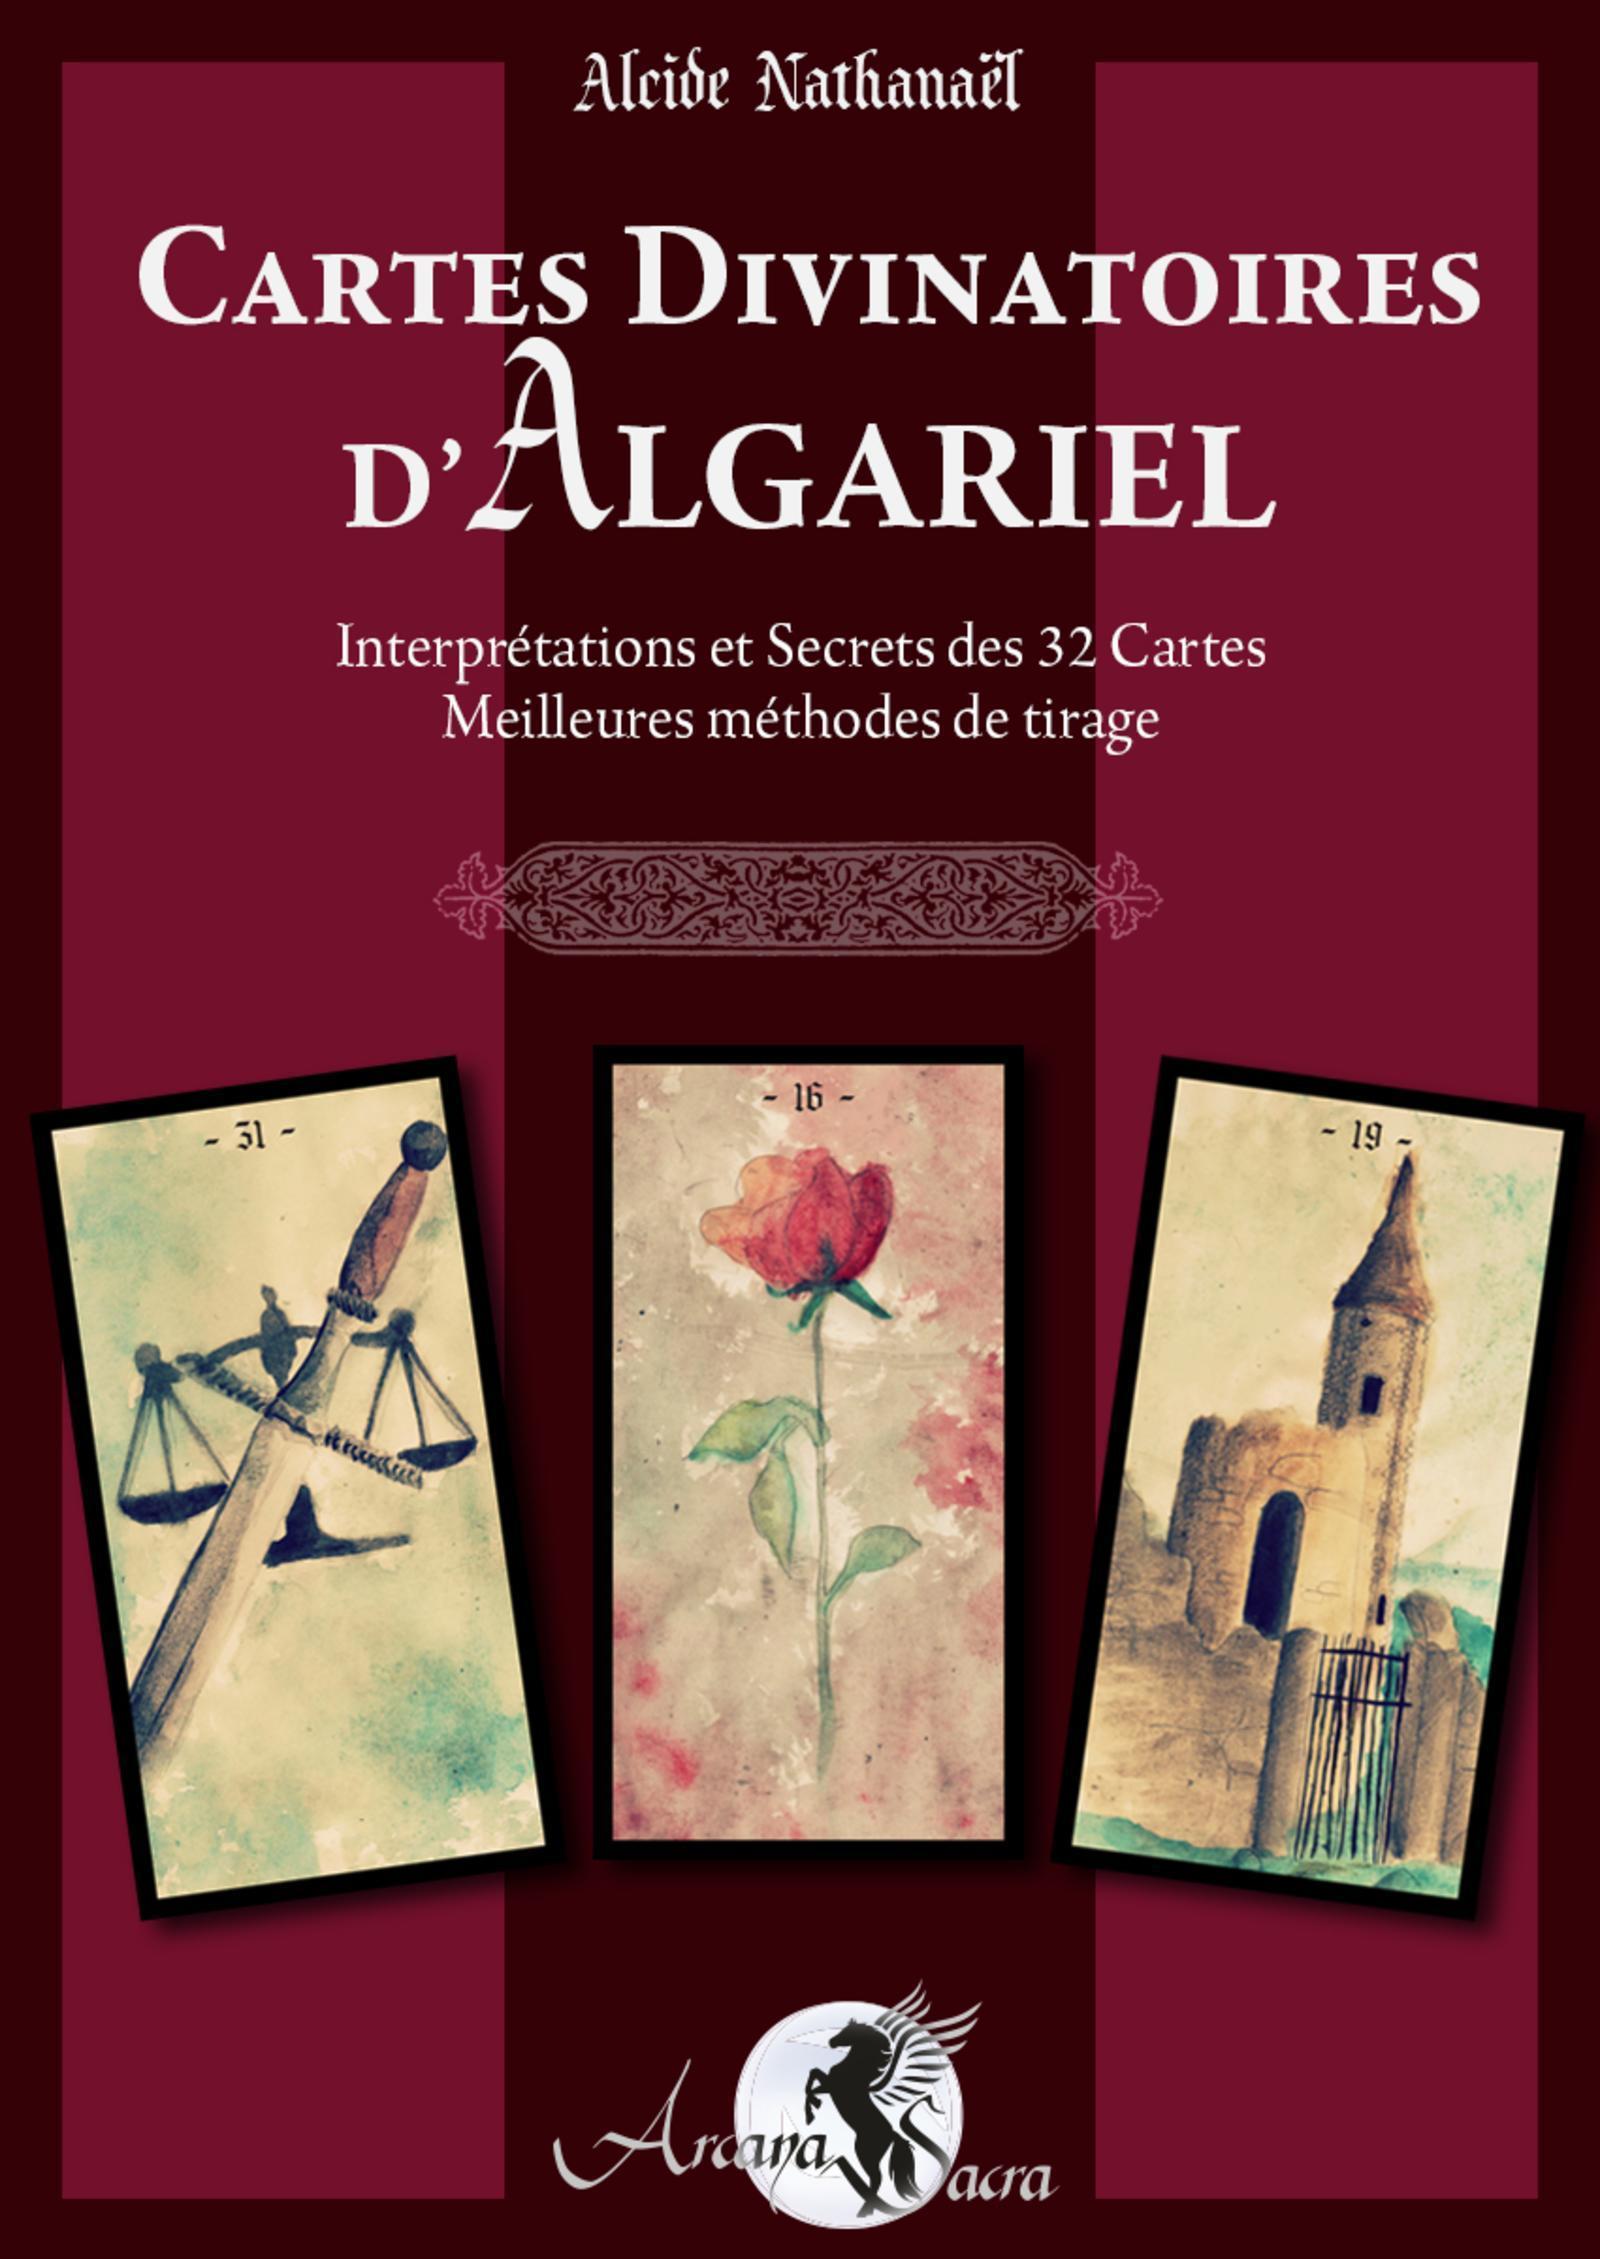 CARTES DIVINATOIRES D ALGARIEL